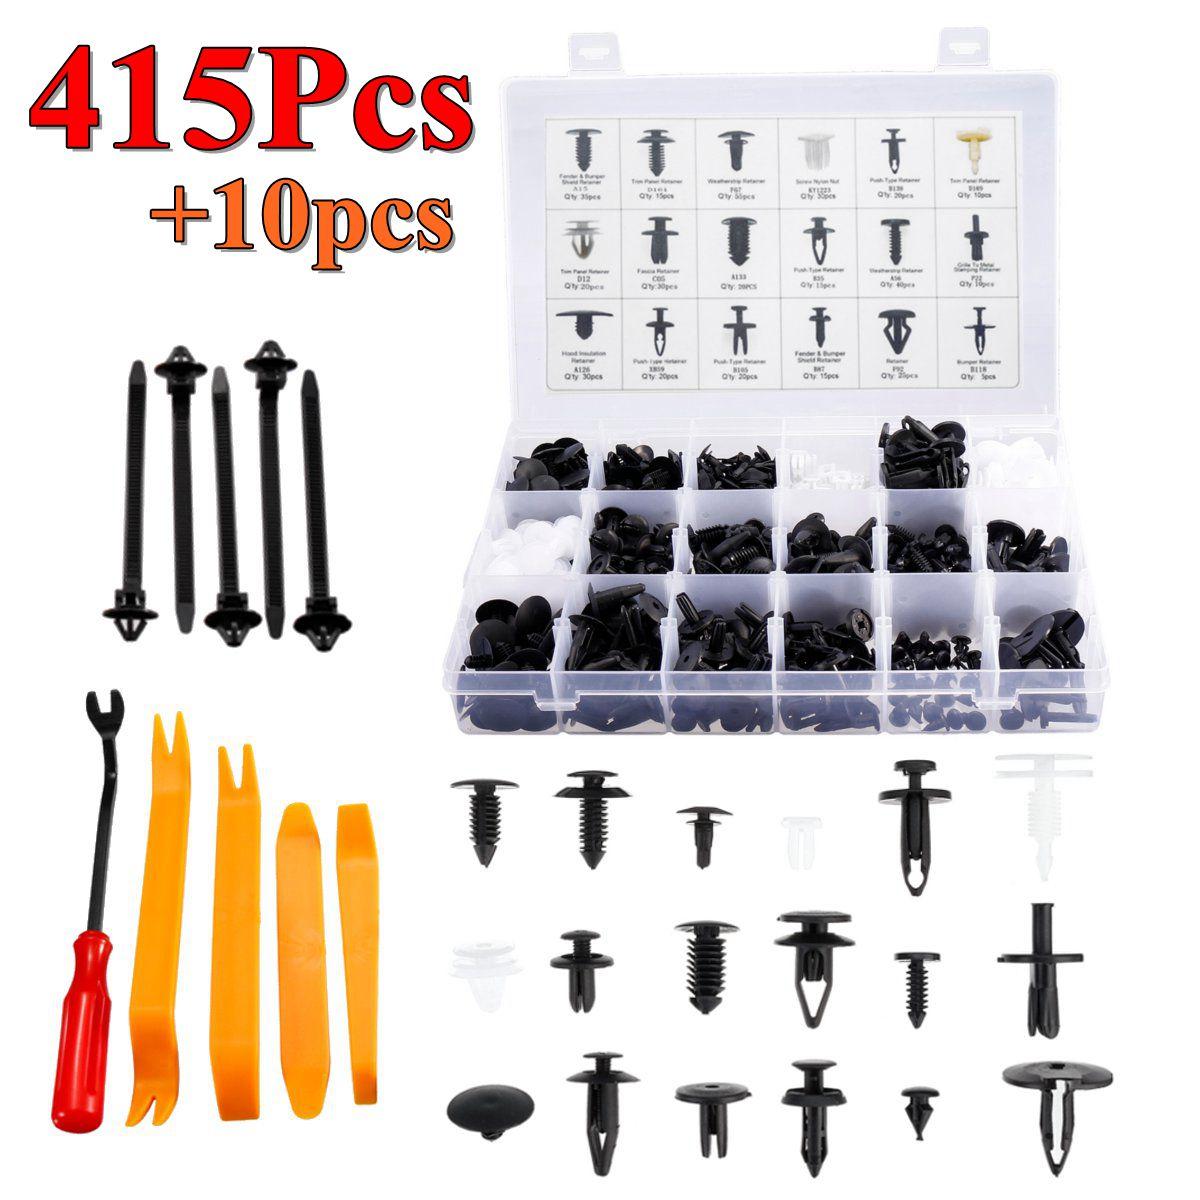 415pcs Car Push Pin Rivet Bumper Door Panel Clips Retainer Fastener Kit For Ford